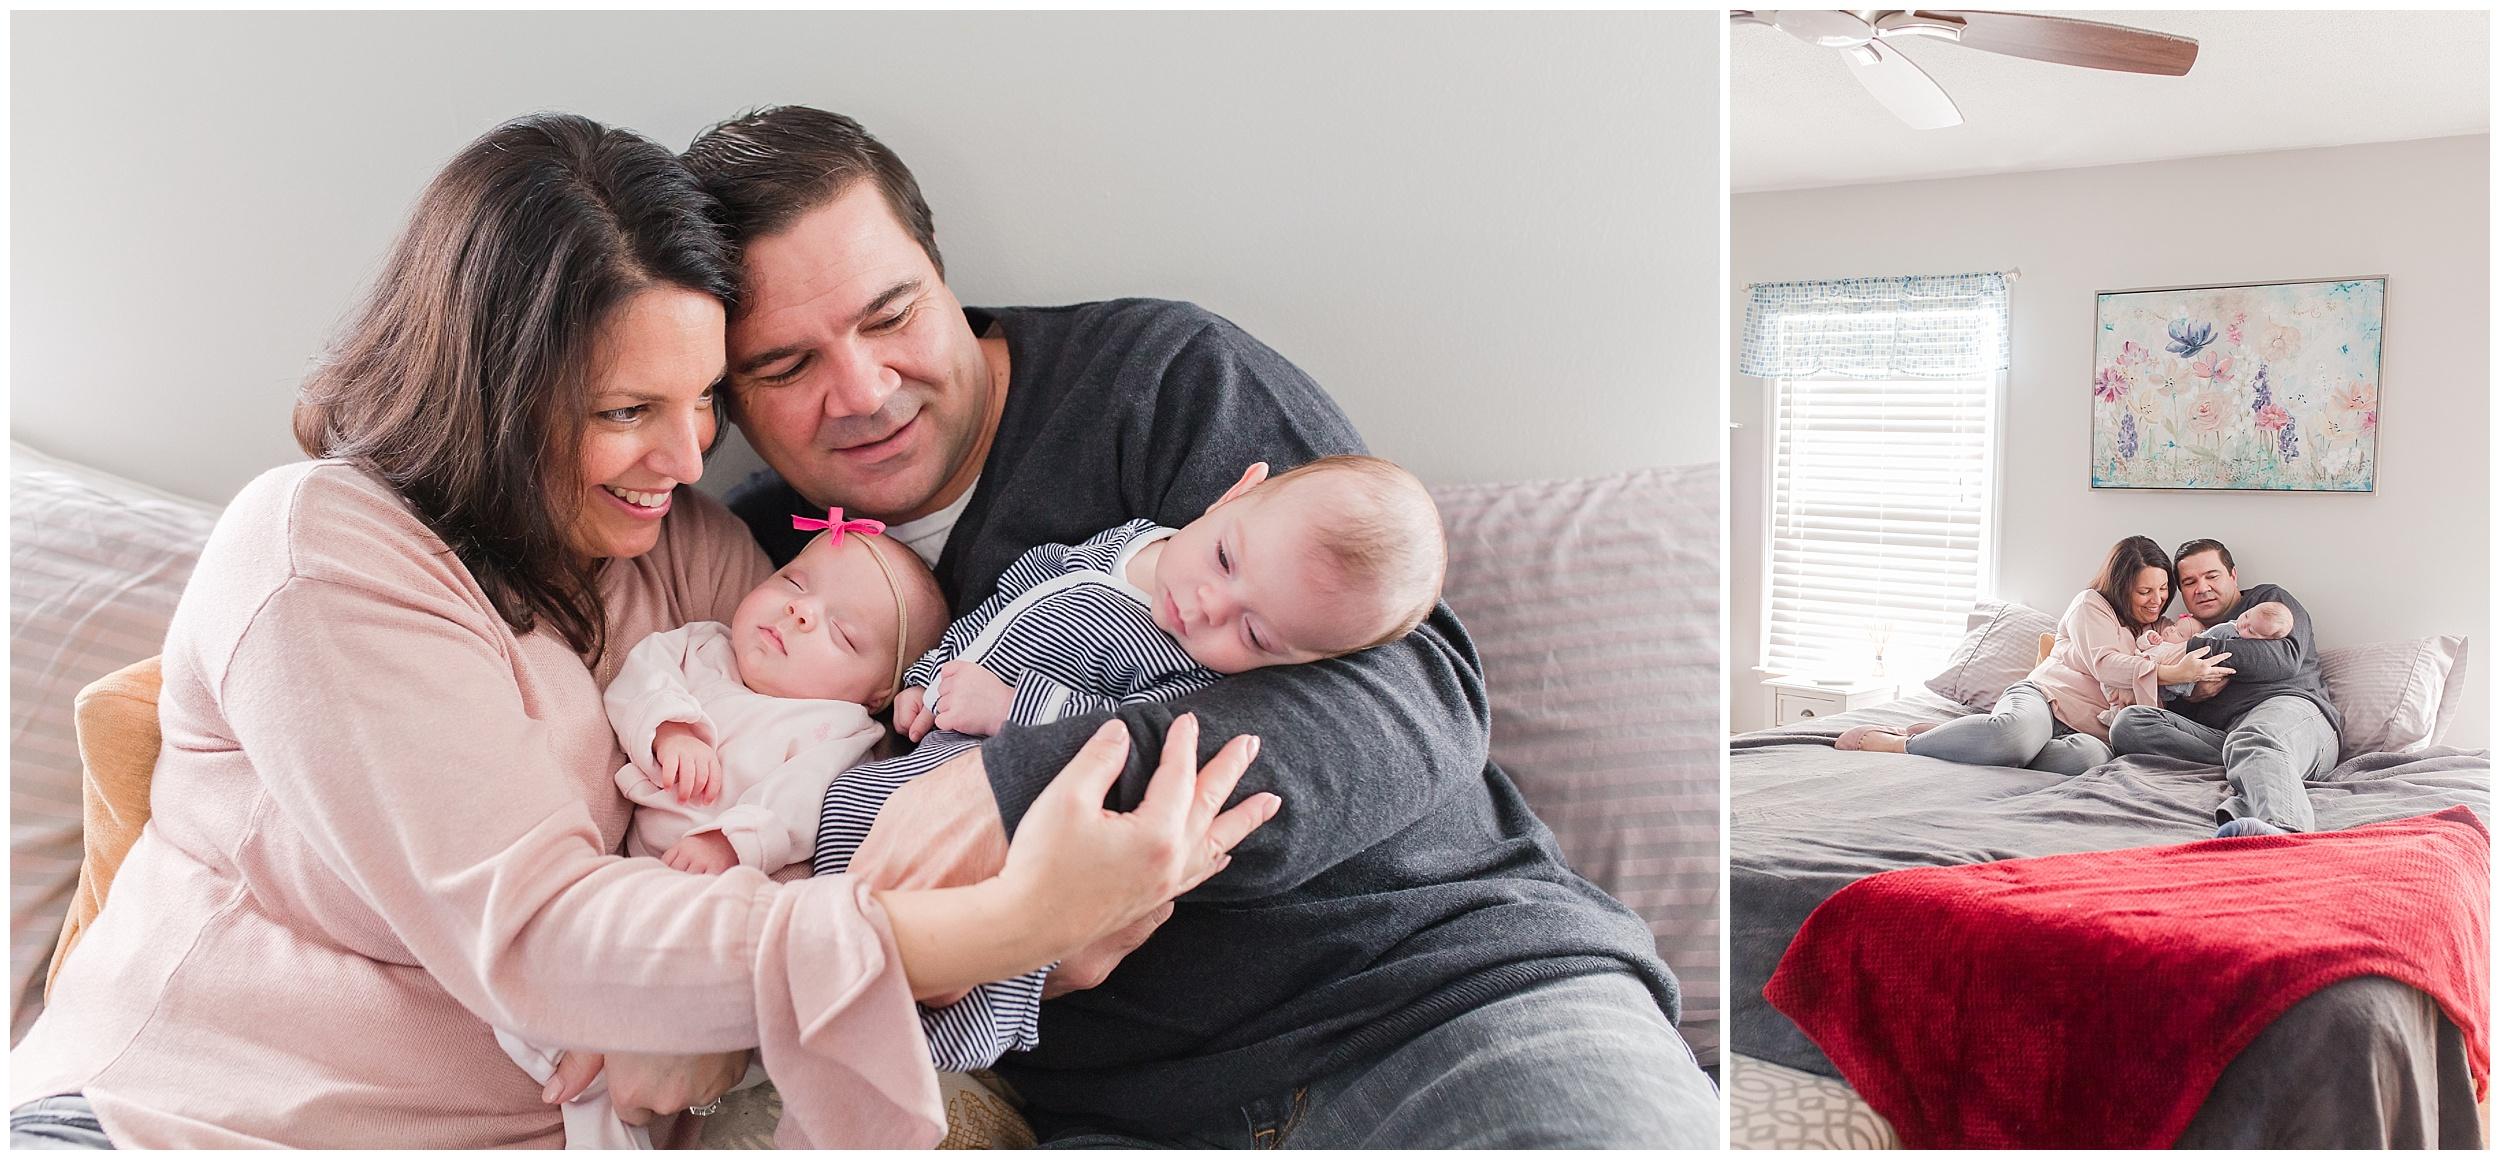 Family_Photos_at_home_Greenville_171219_Newborn_Glynn_Twins_151_stomp.jpg